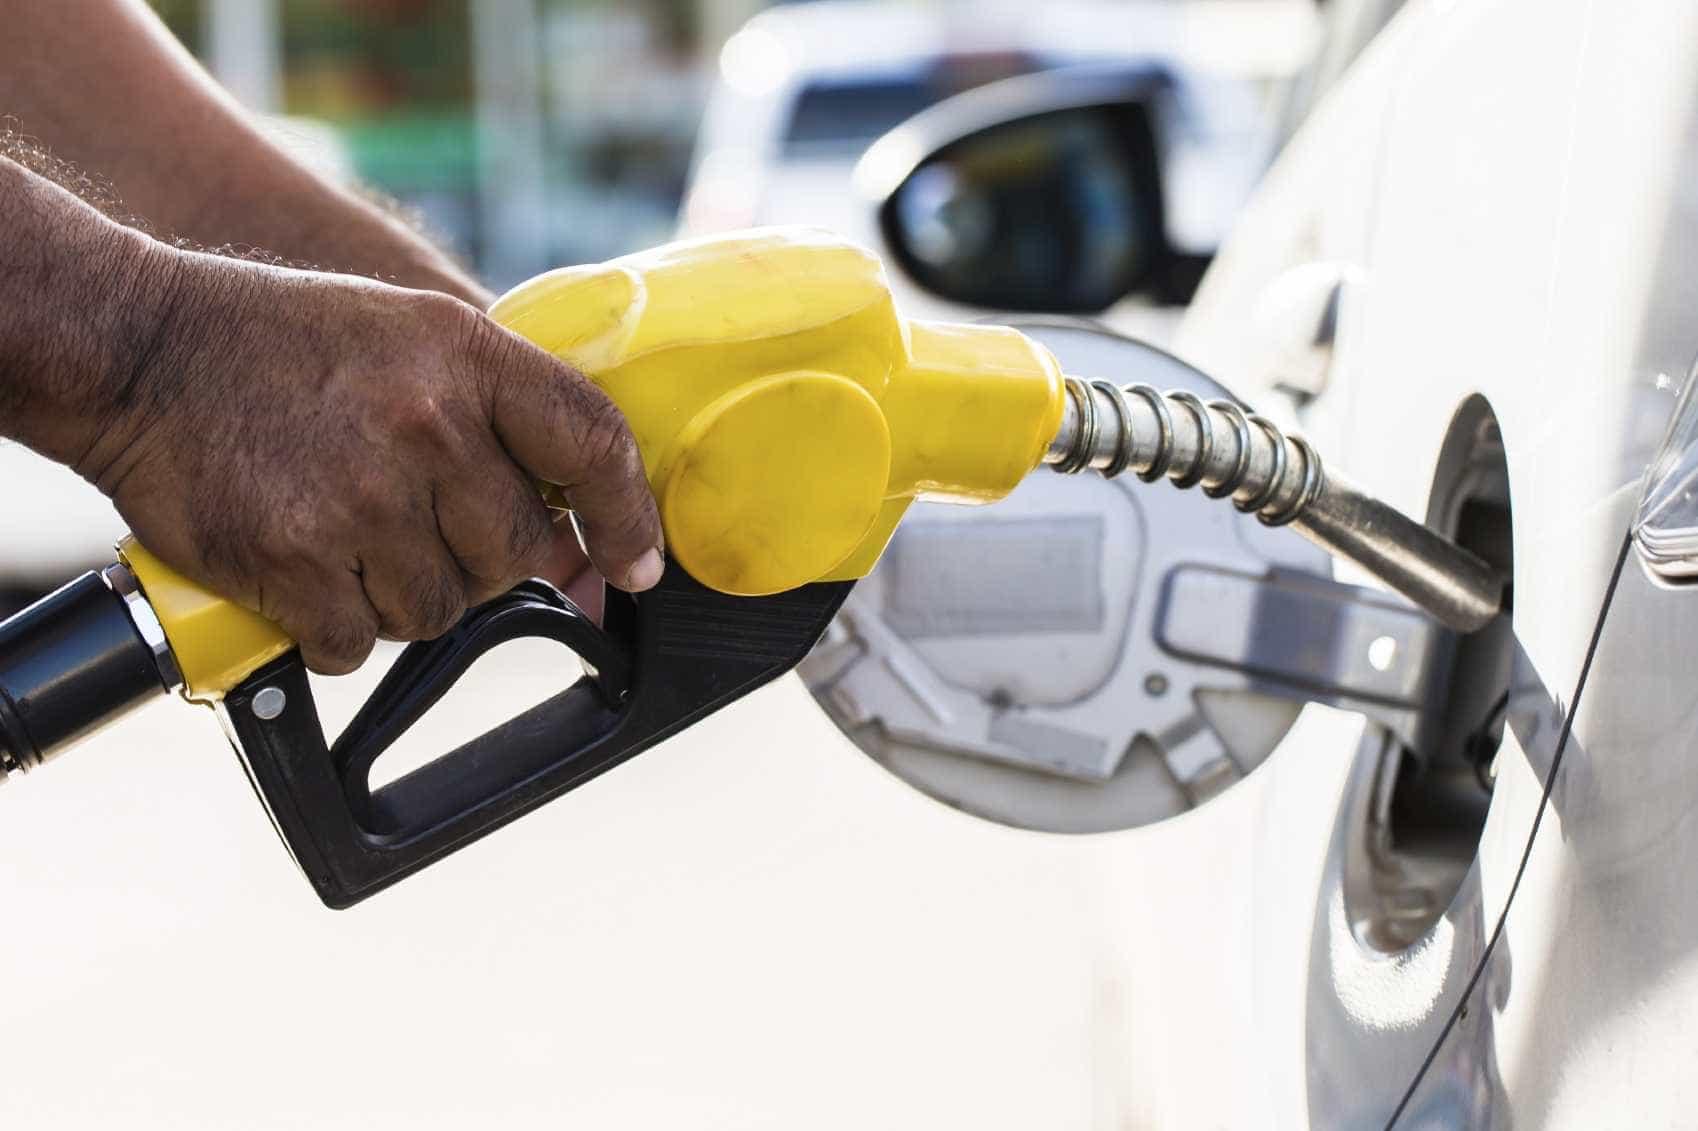 Combustíveis? A próxima semana promete descidas